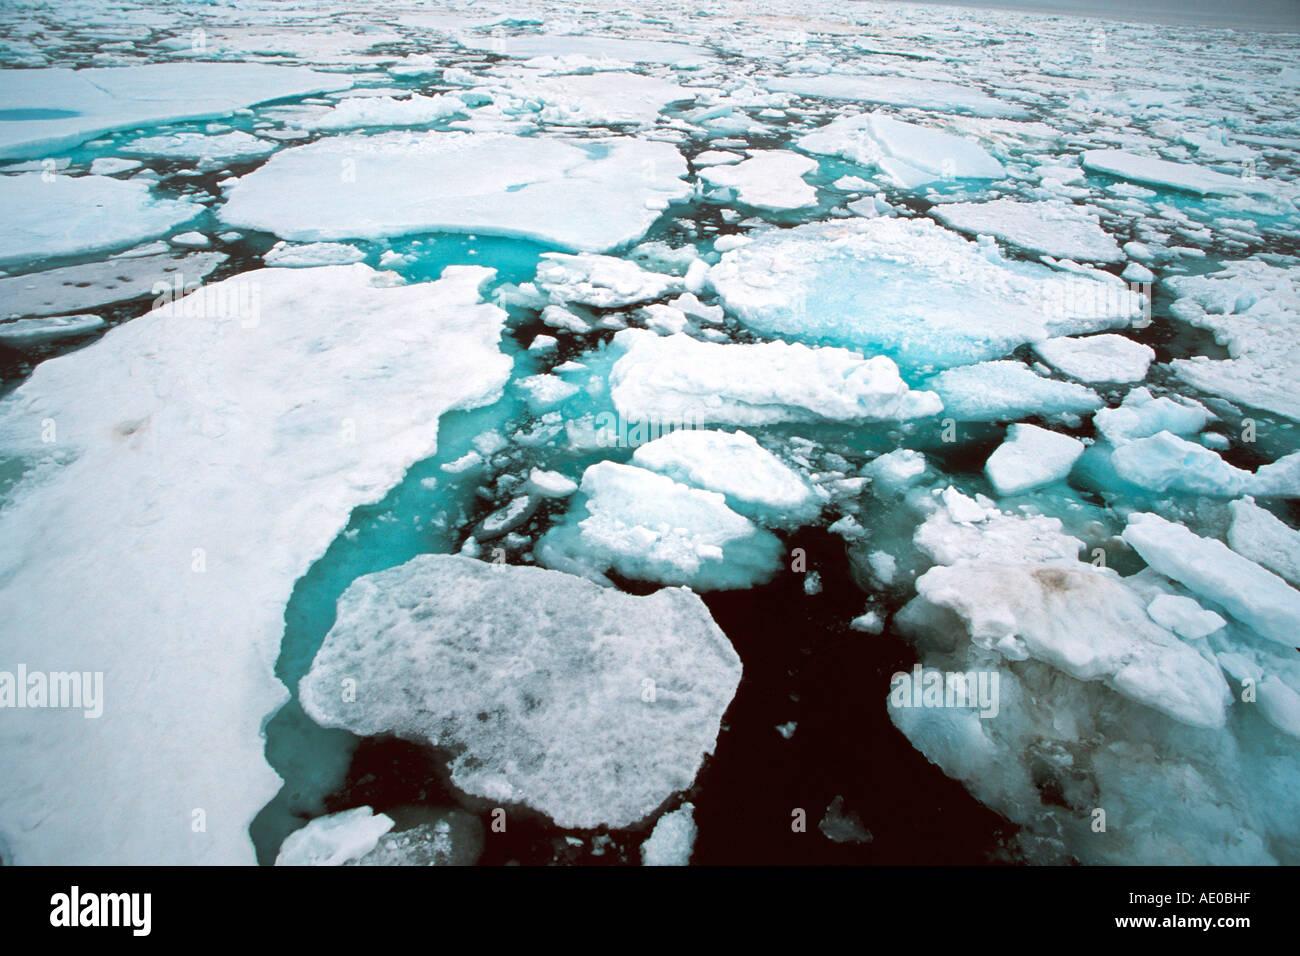 Deriva pack di Ghiaccio Ghiaccio Ghiaccio campo oceano actic Treibeis Packeis Eisfeld Arktis Ozean Svalbard Spitzbergen Foto Stock